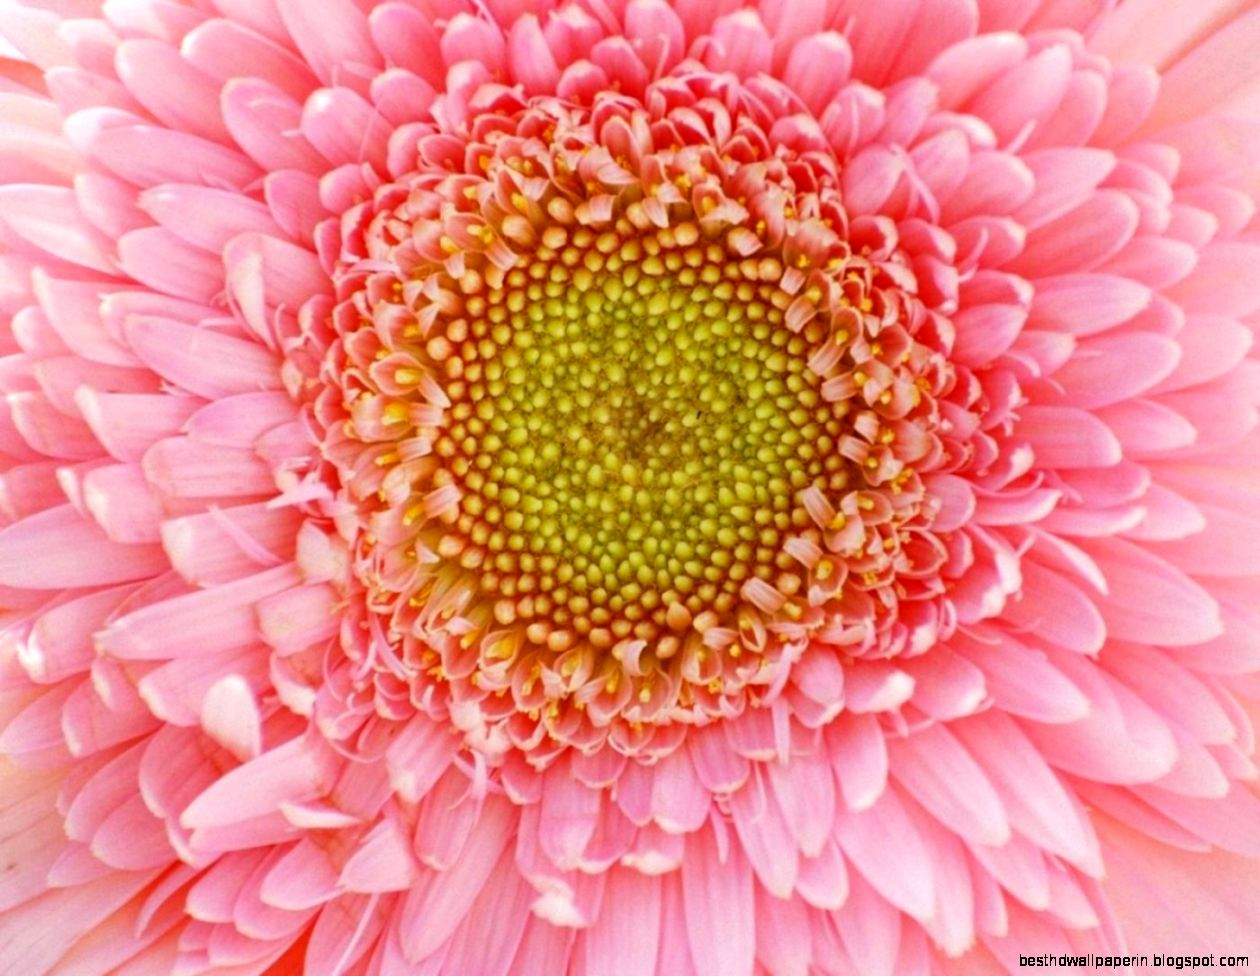 Beautiful flower images free download best hd wallpapers view original size izmirmasajfo